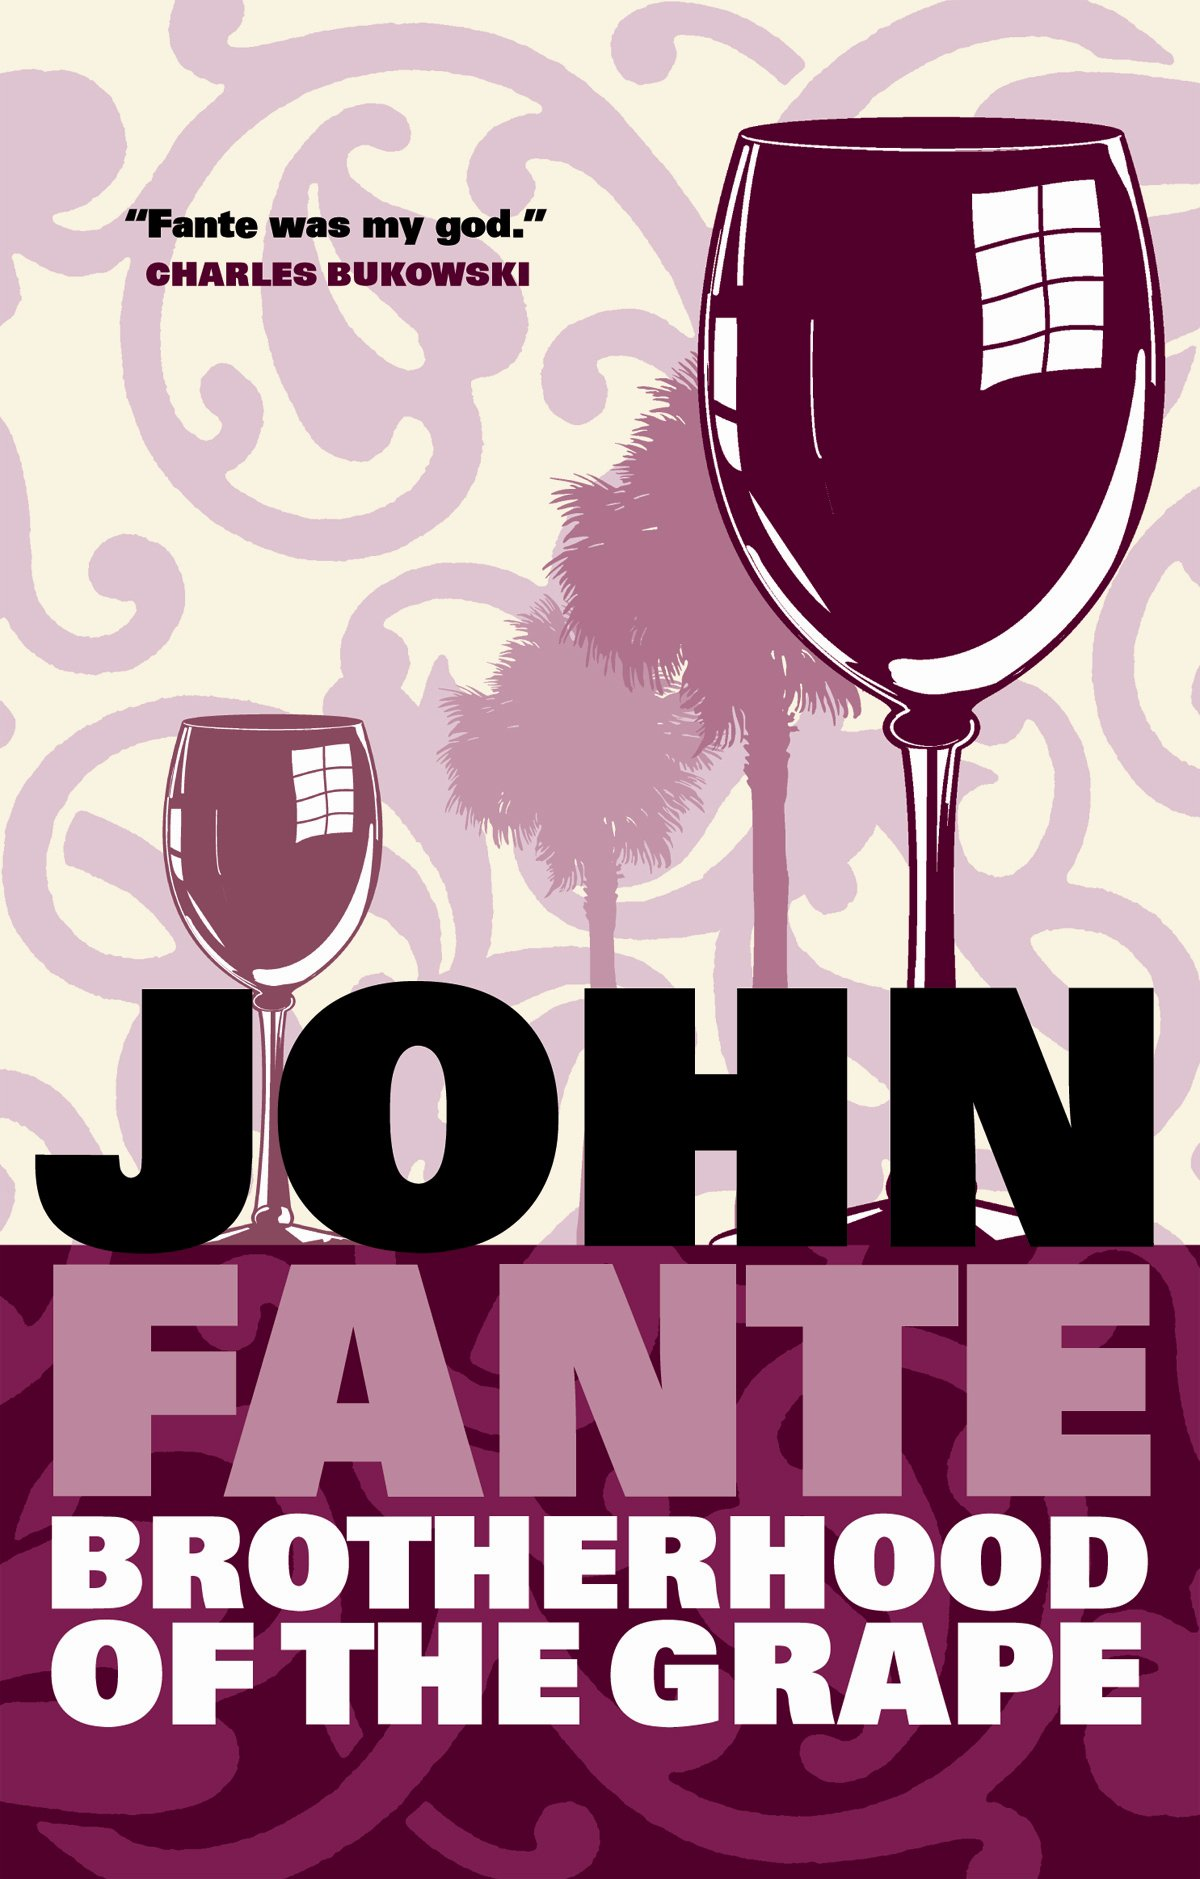 The Brotherhood of the Grape ebook